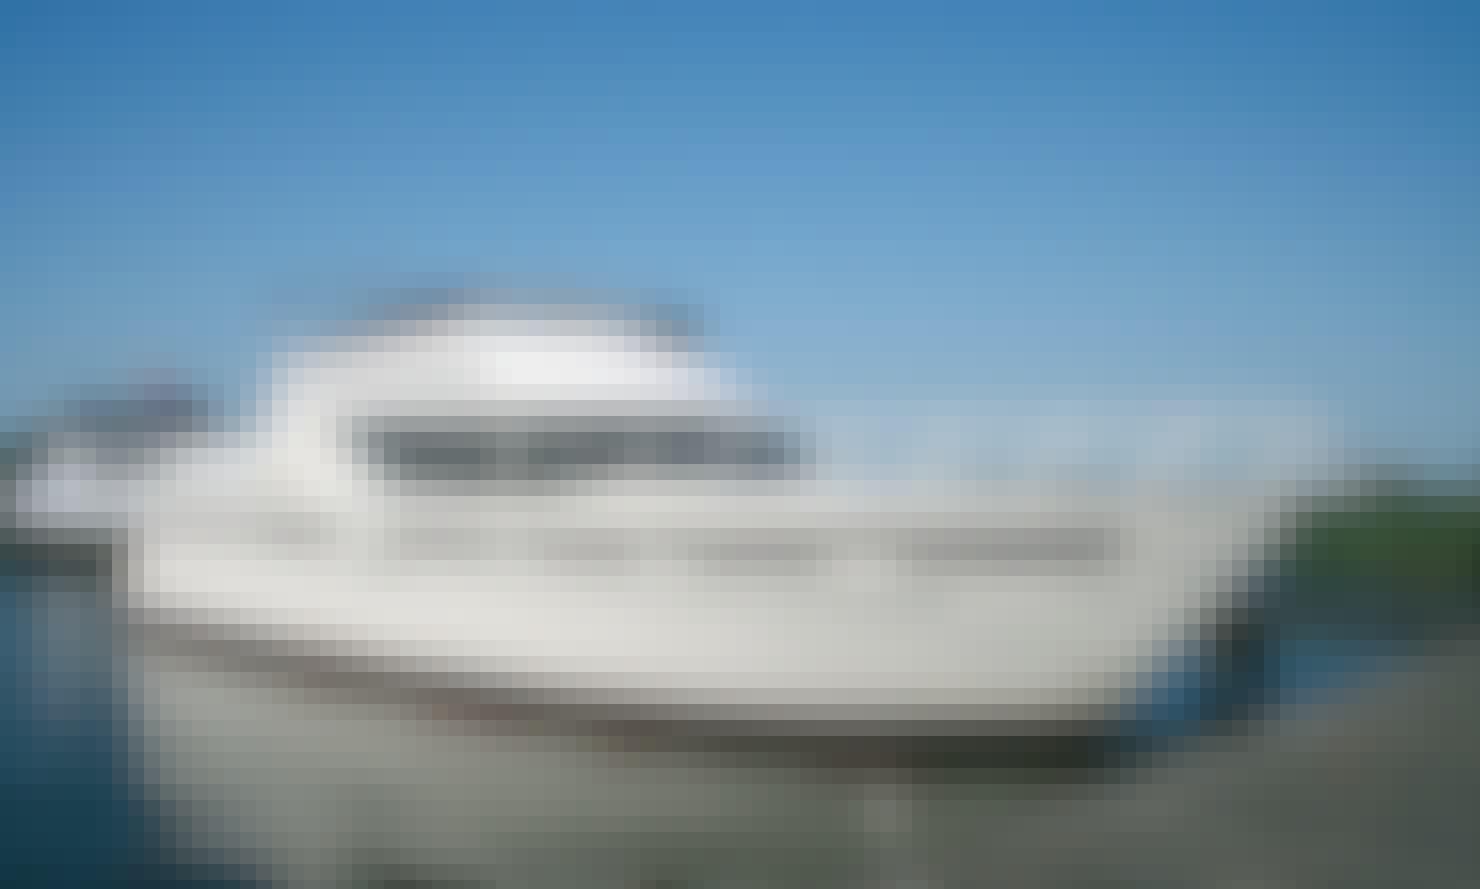 46' Super Nova 1400 Motor Yacht Charter in Drachten - Friesland, Netherlands